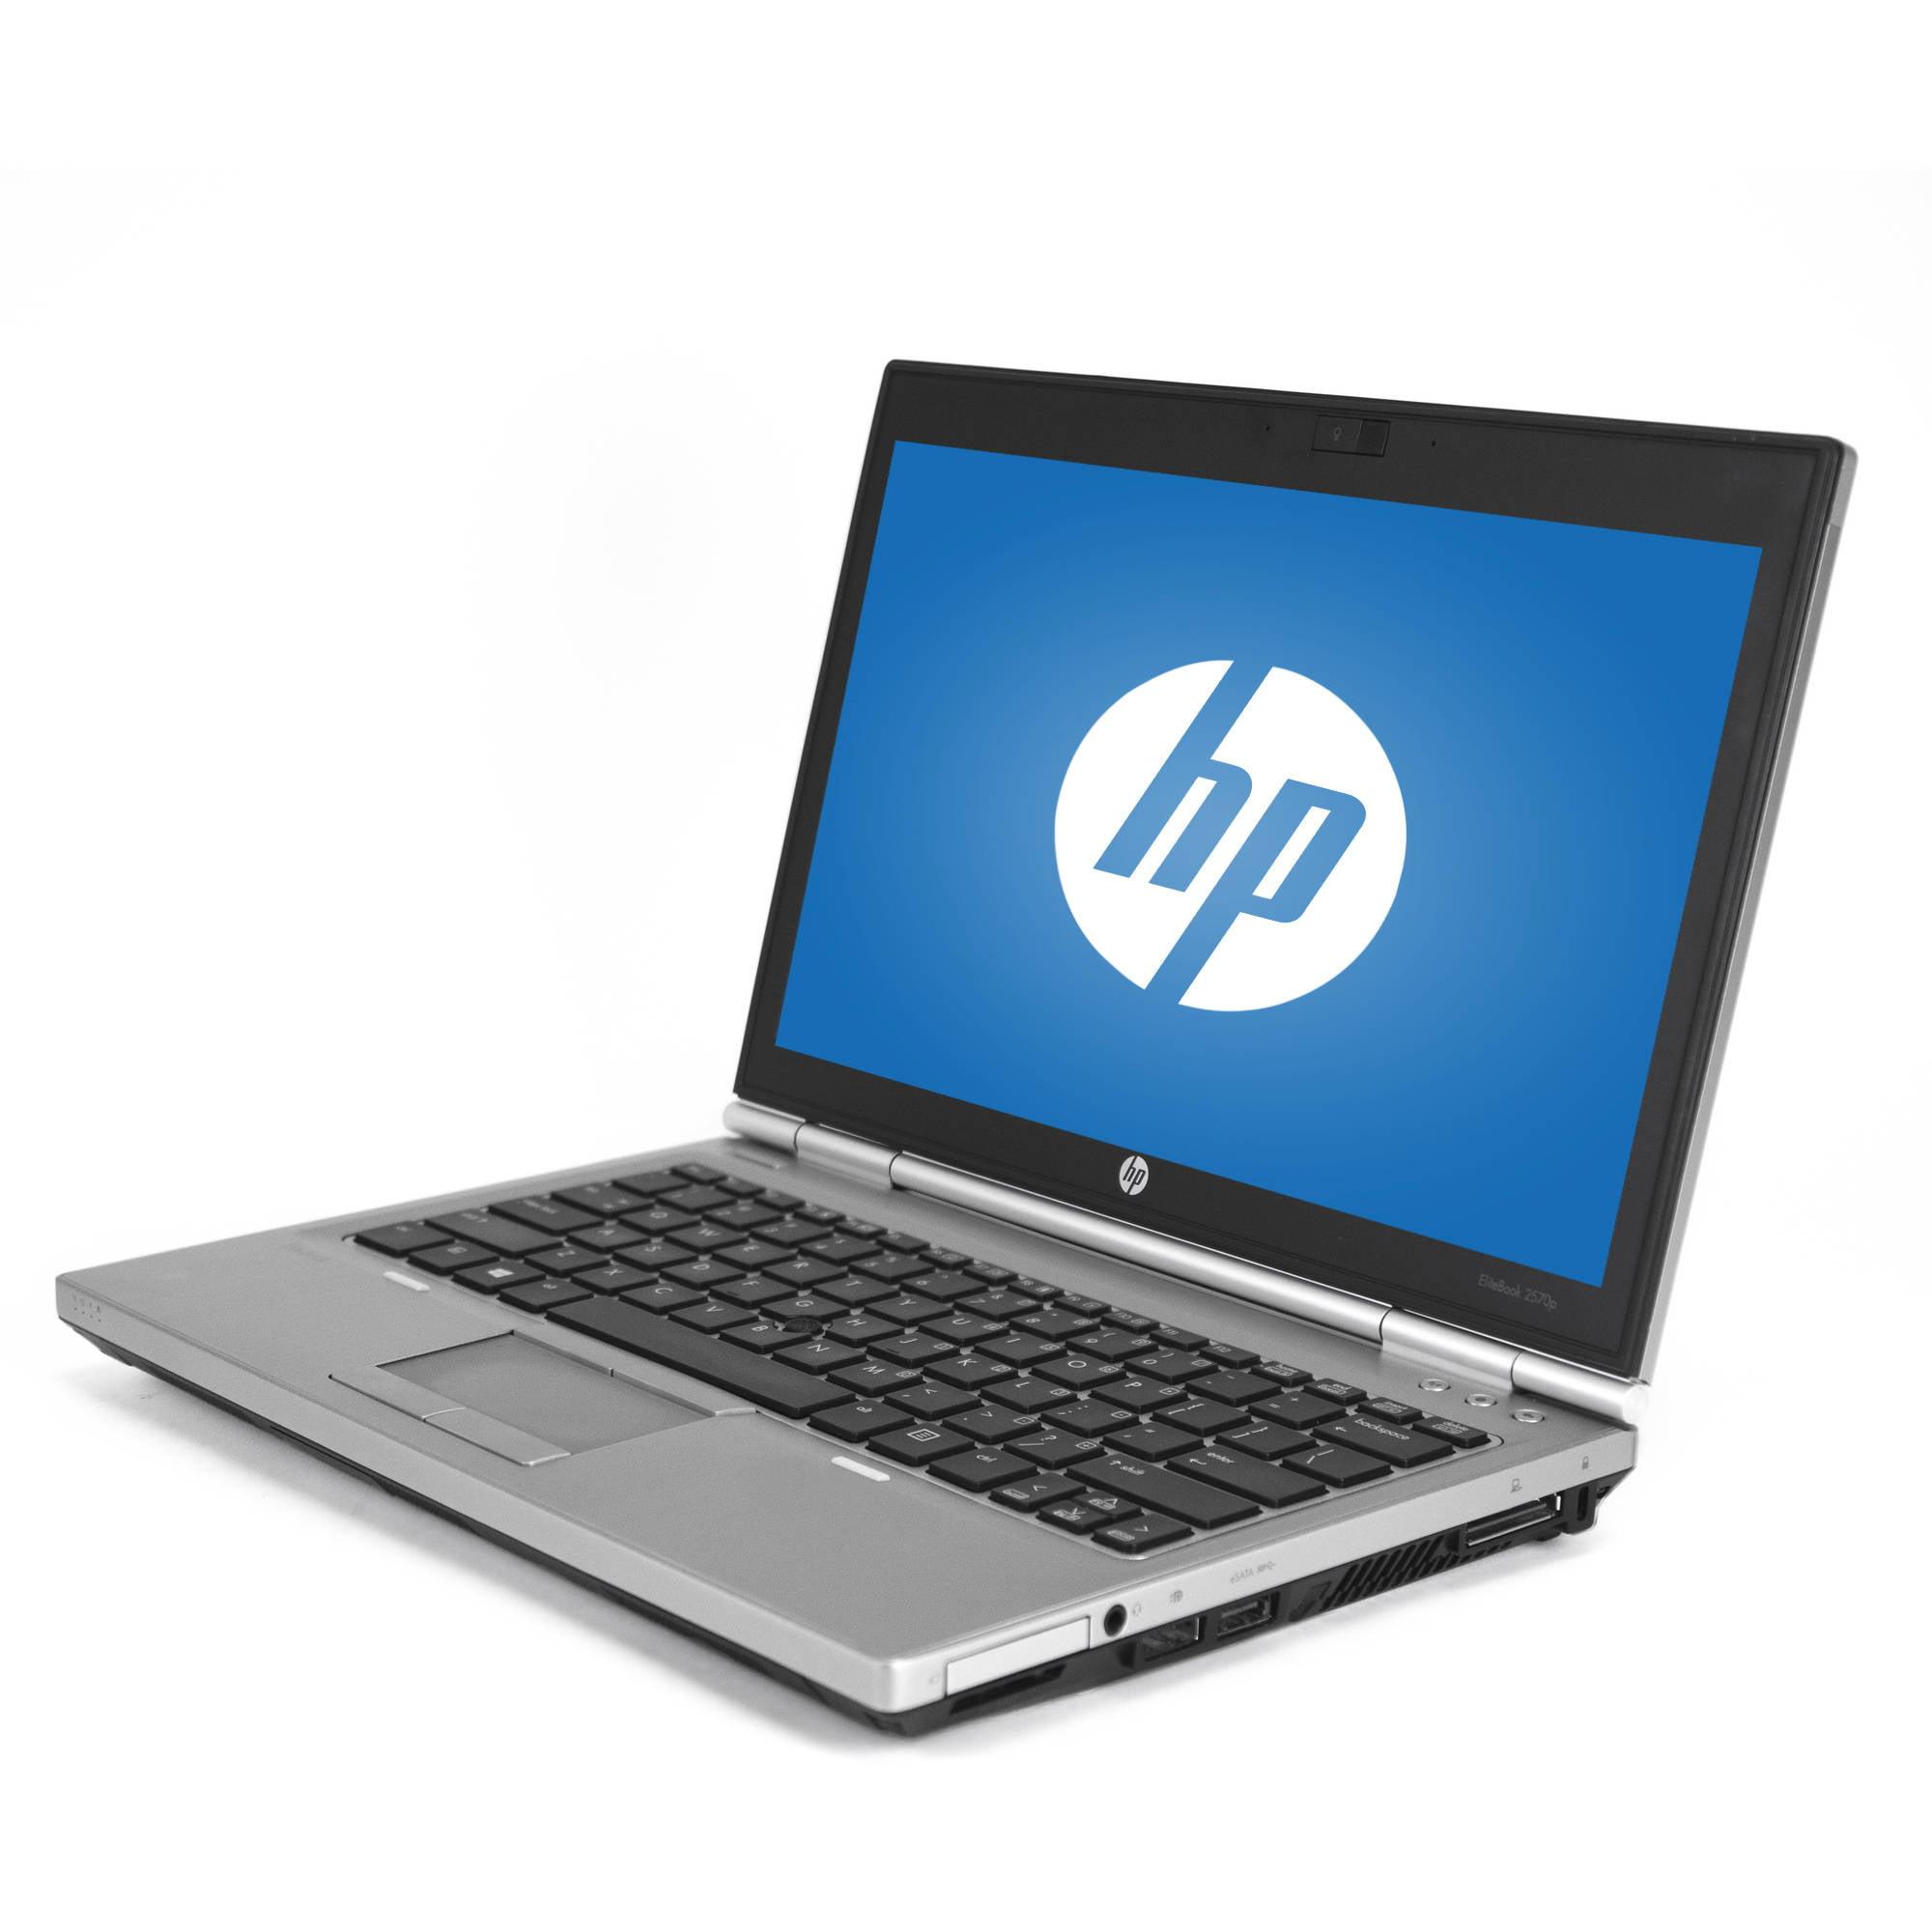 List Laptop CAO CẤP SHIP USA : Dell Latitude, Hp Elitebook, Lenovo Thinkpad - BẢO HÀNH 06 - 12 THÁNG - 18